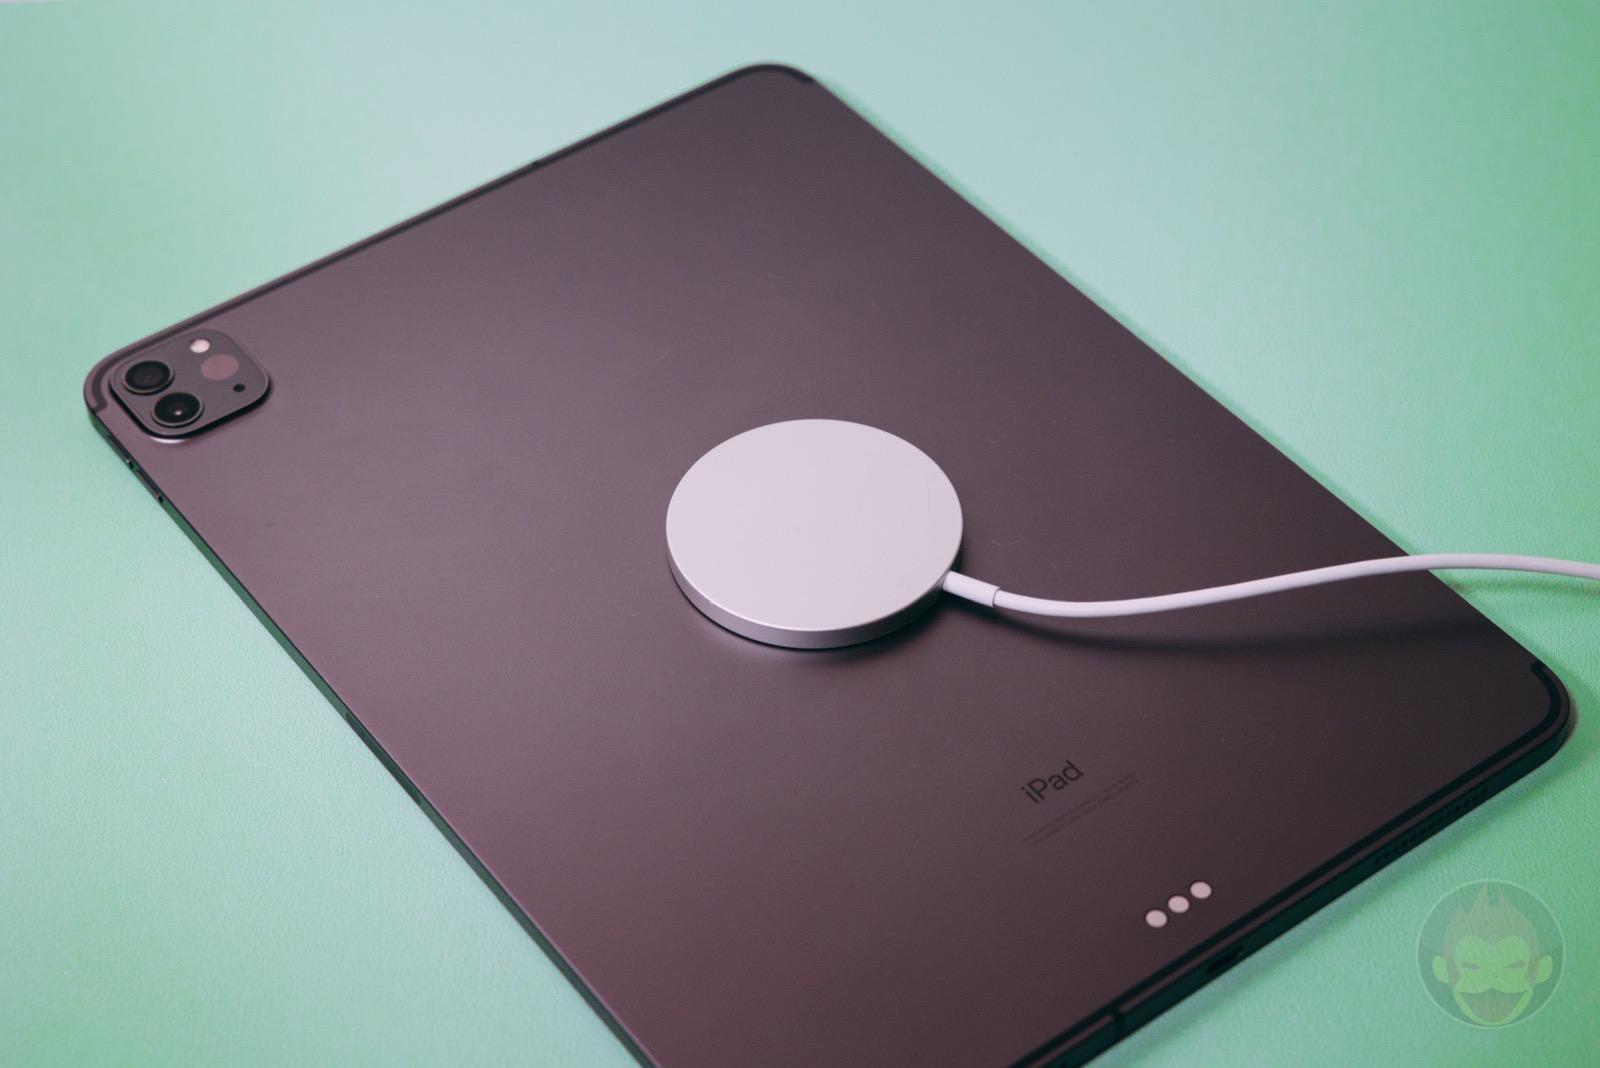 ipad-pro-and-wireless-charging-01.jpg